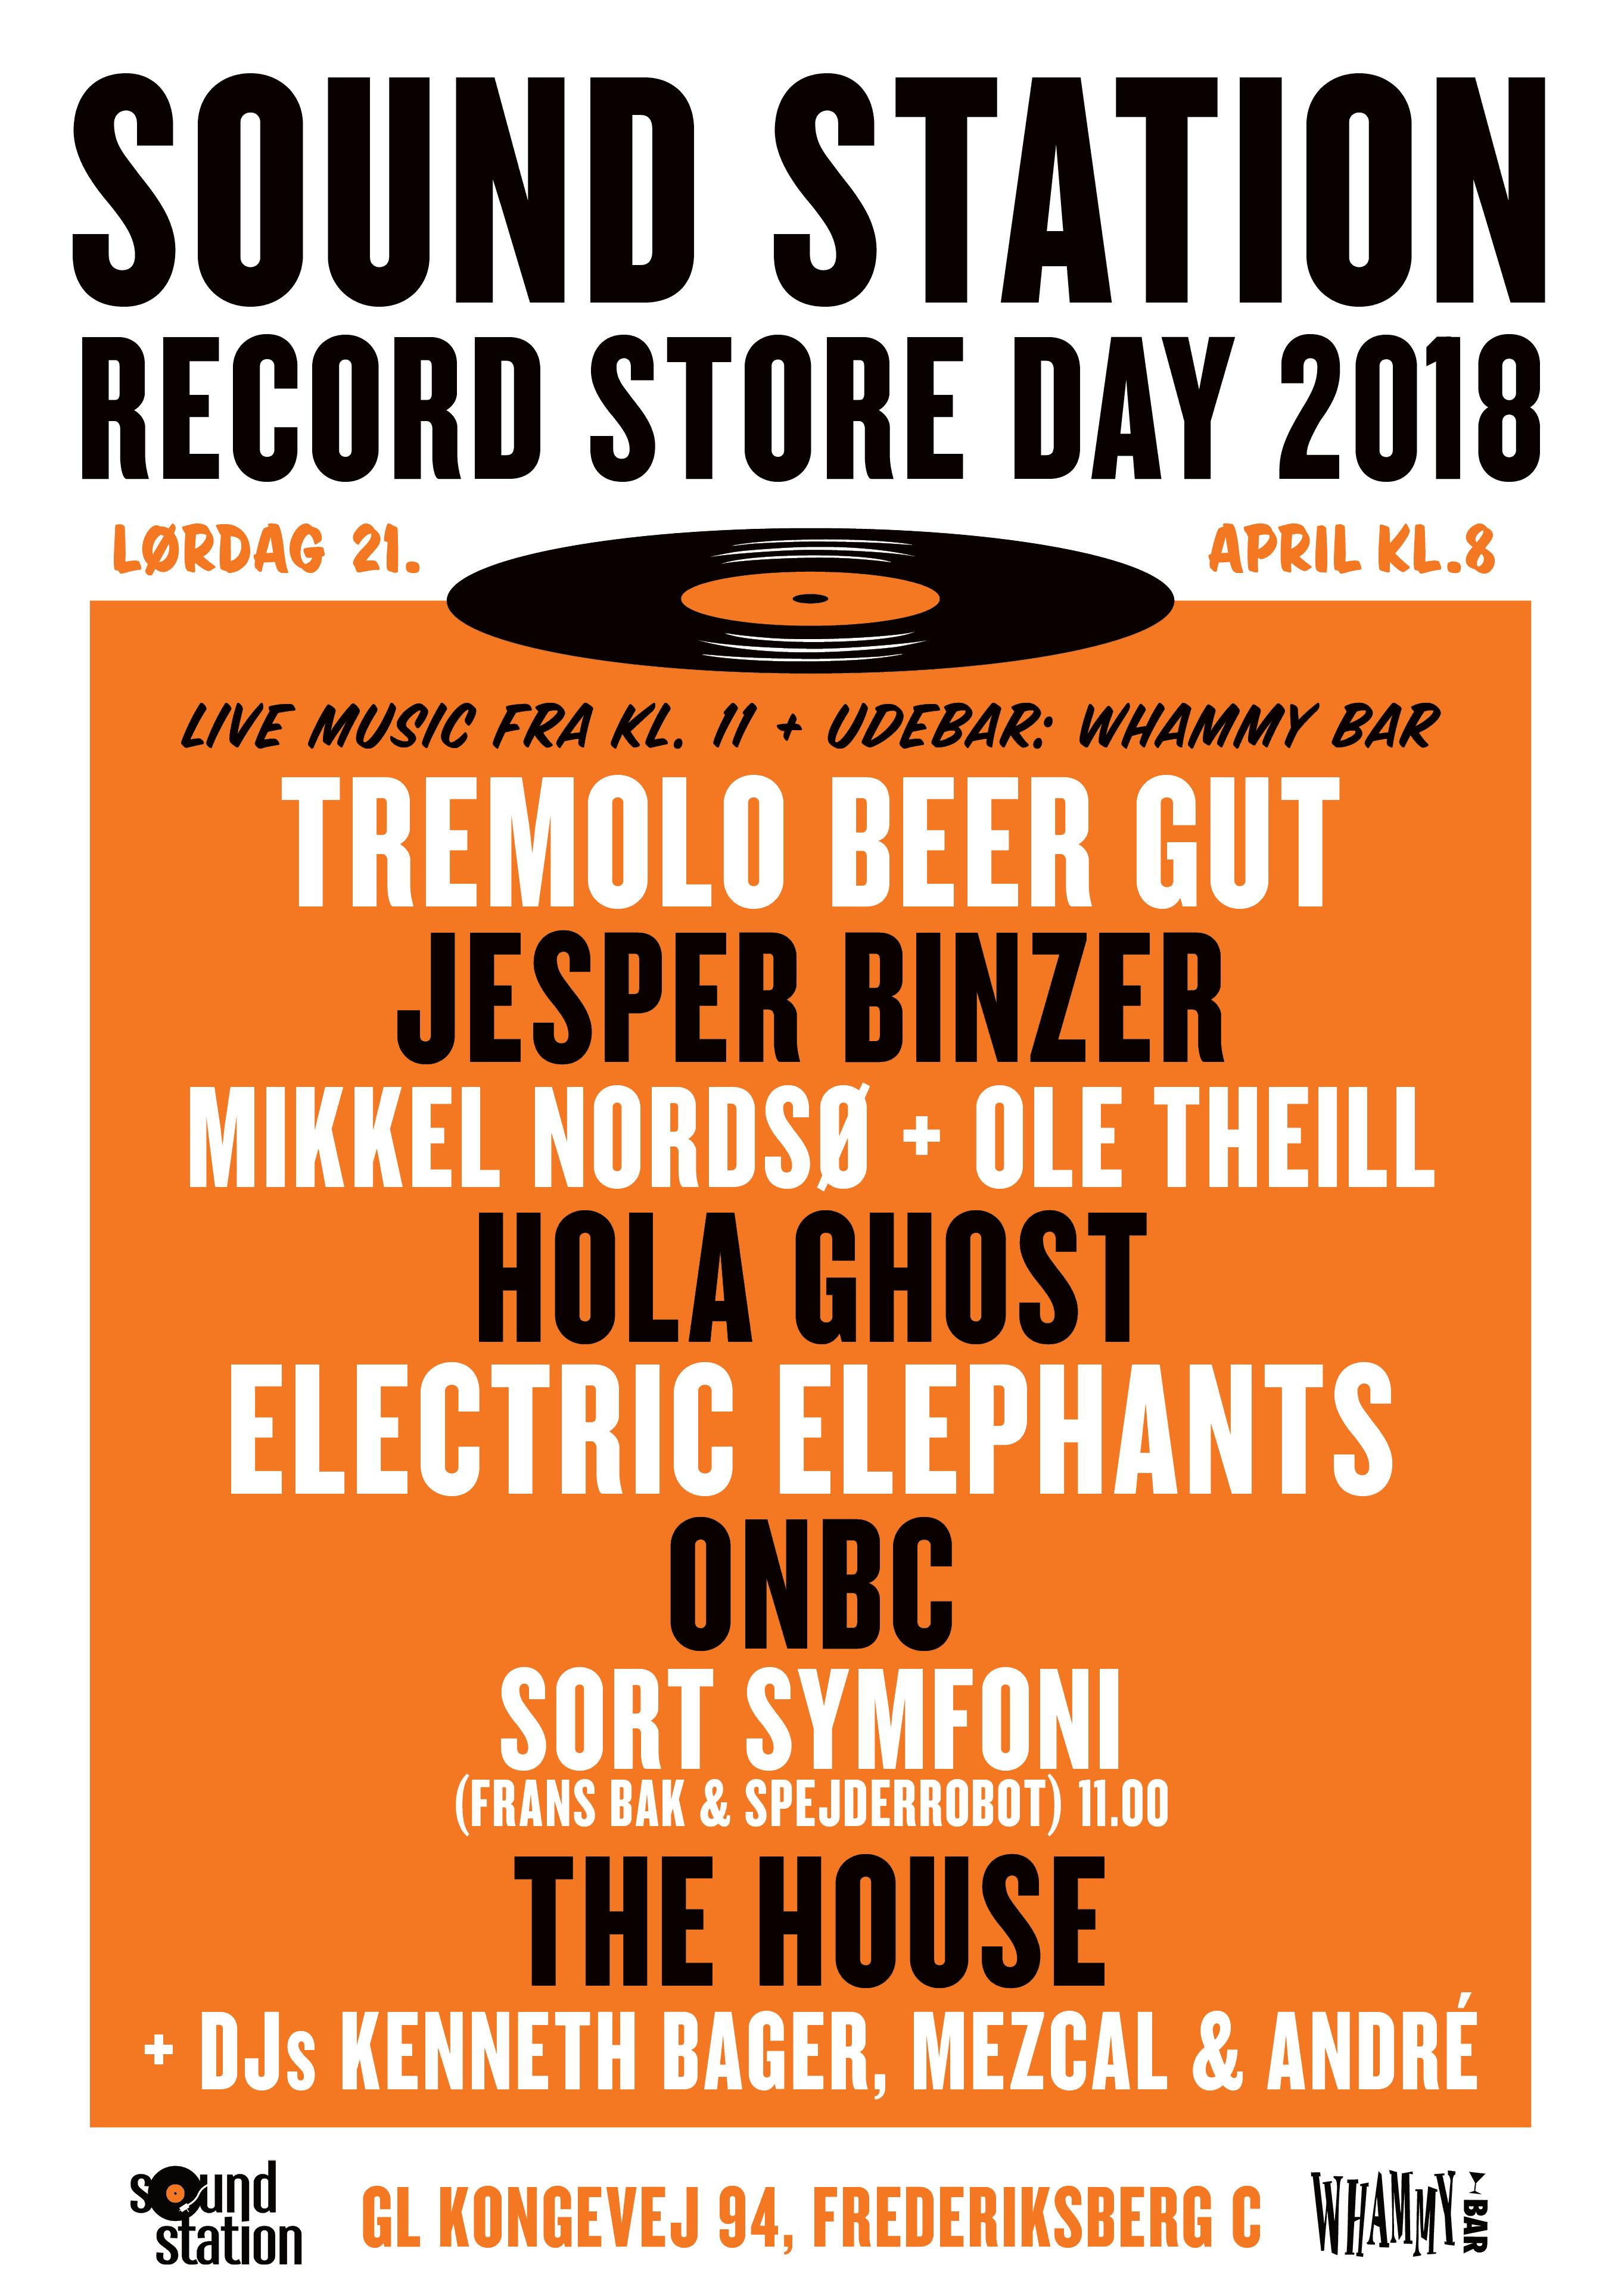 RSD 2018 poster